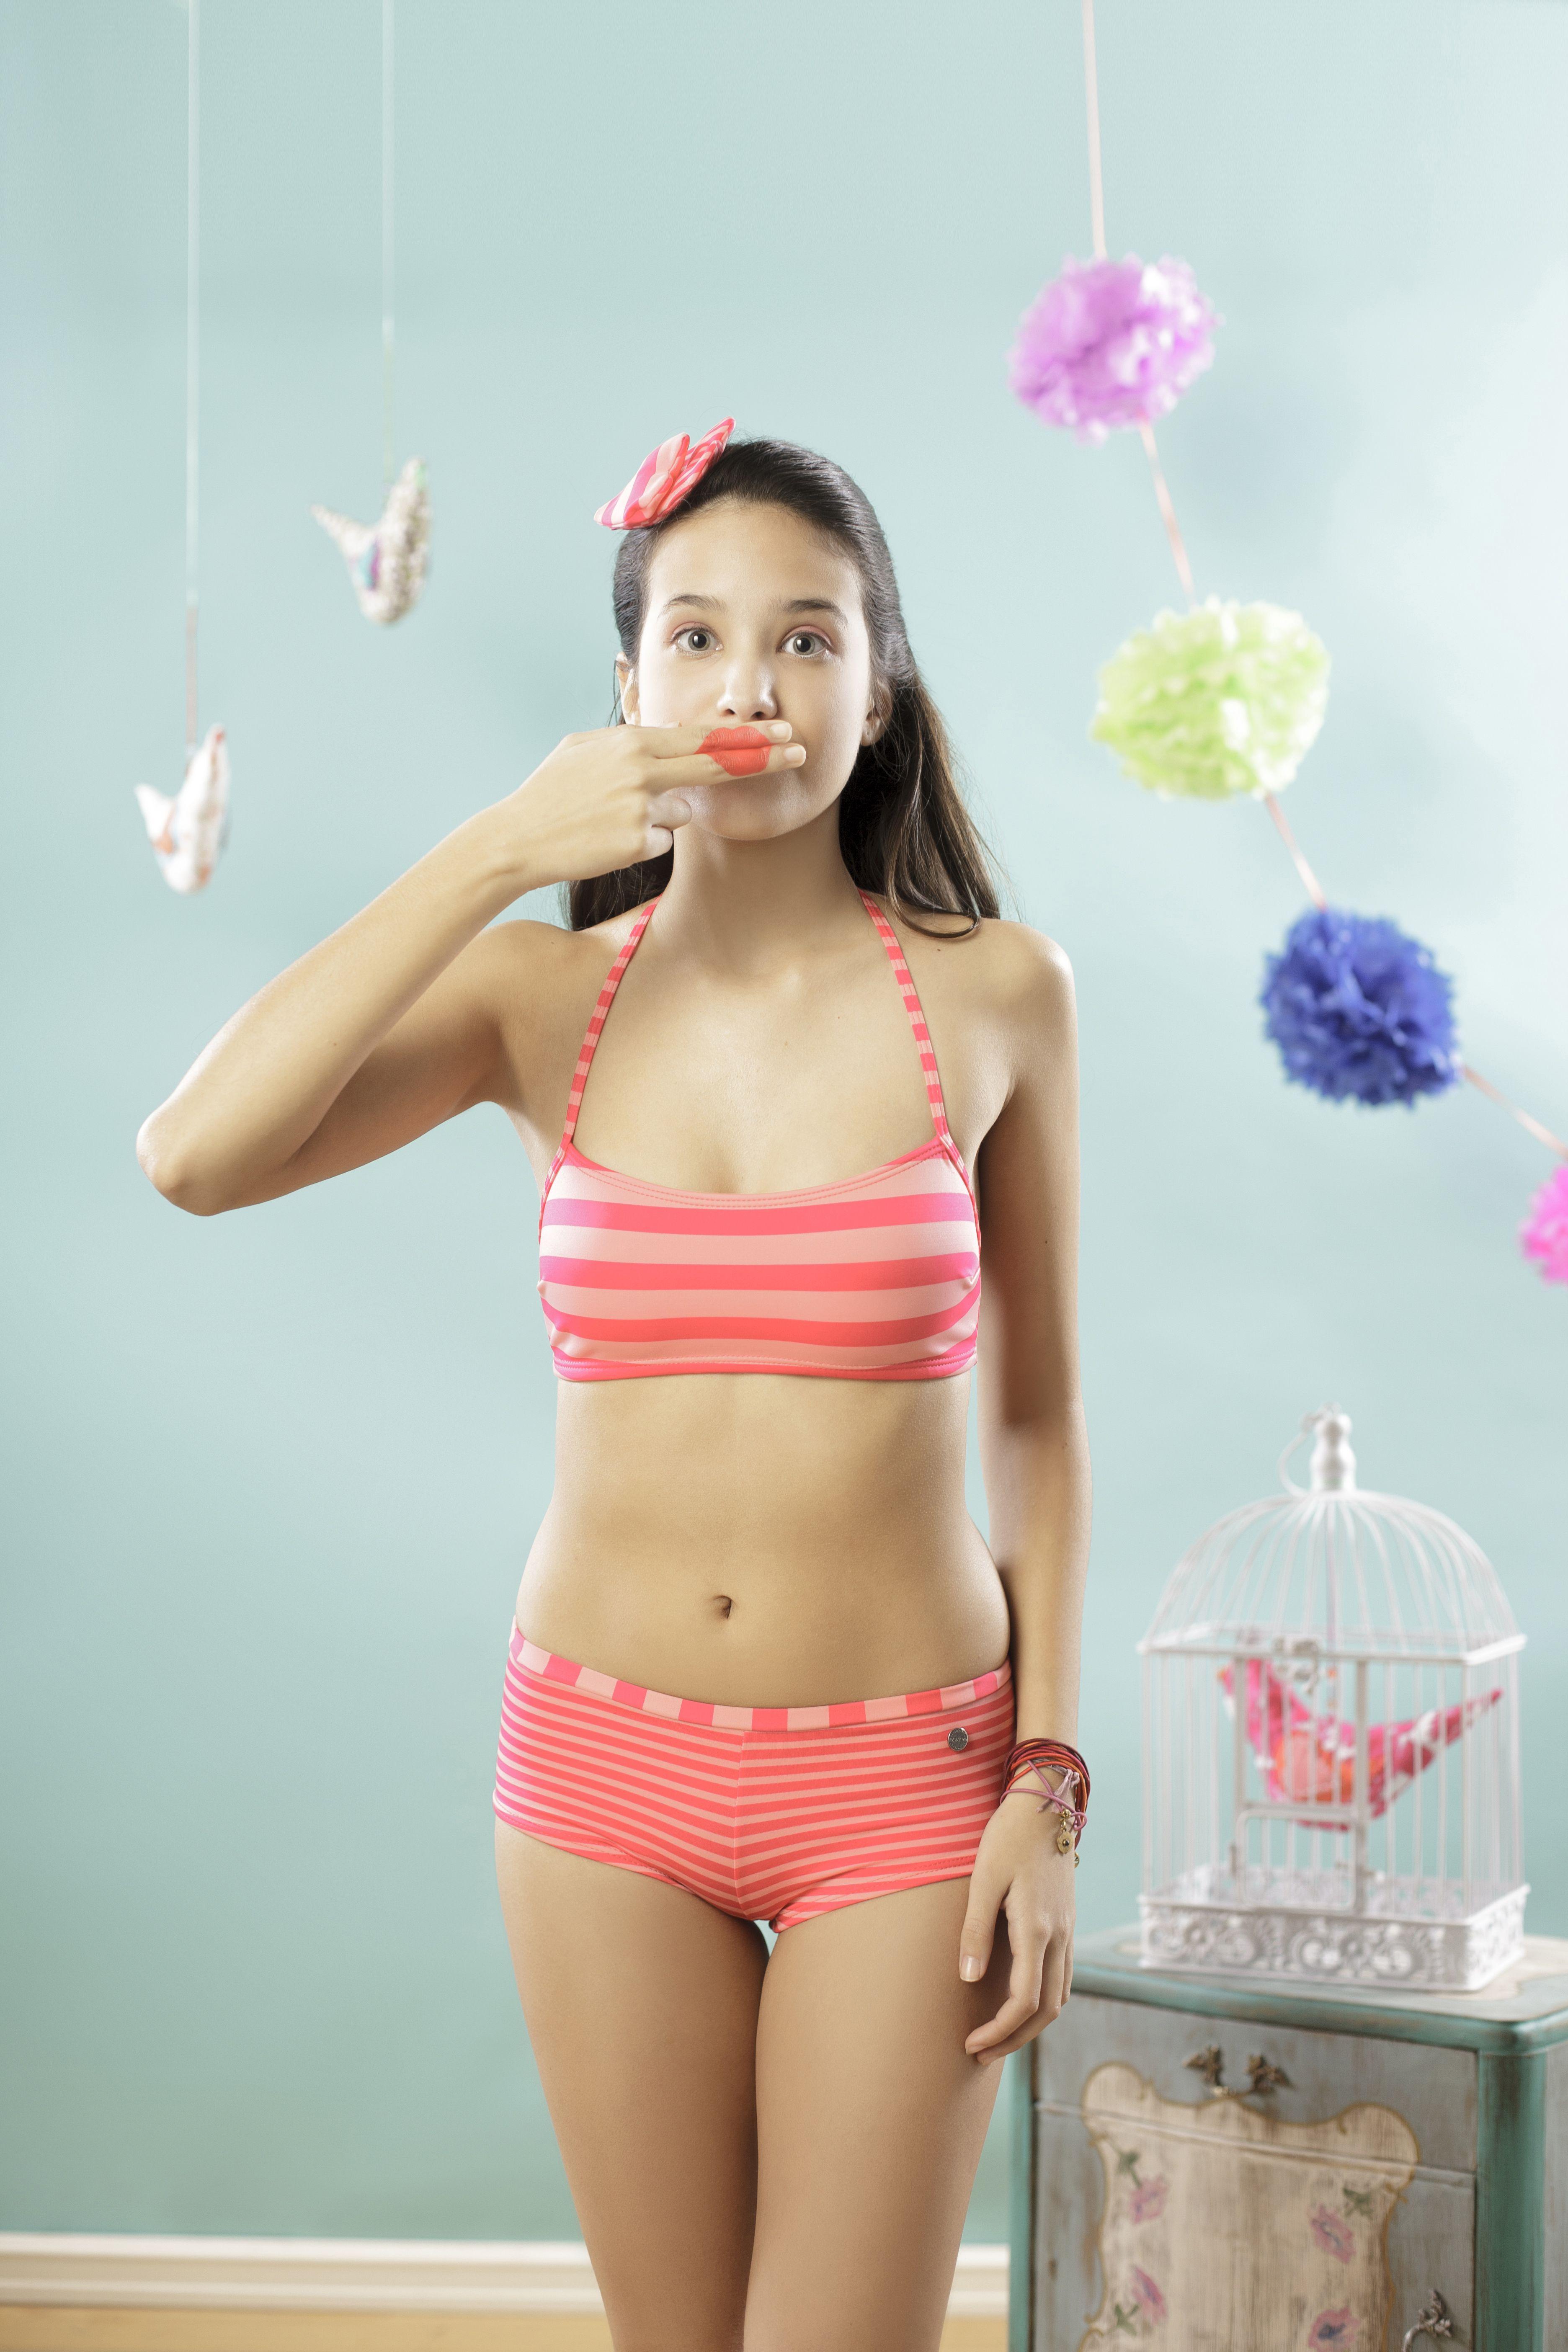 bikini noxion - tiendas abacaxi - córdoba, argentina | noxion